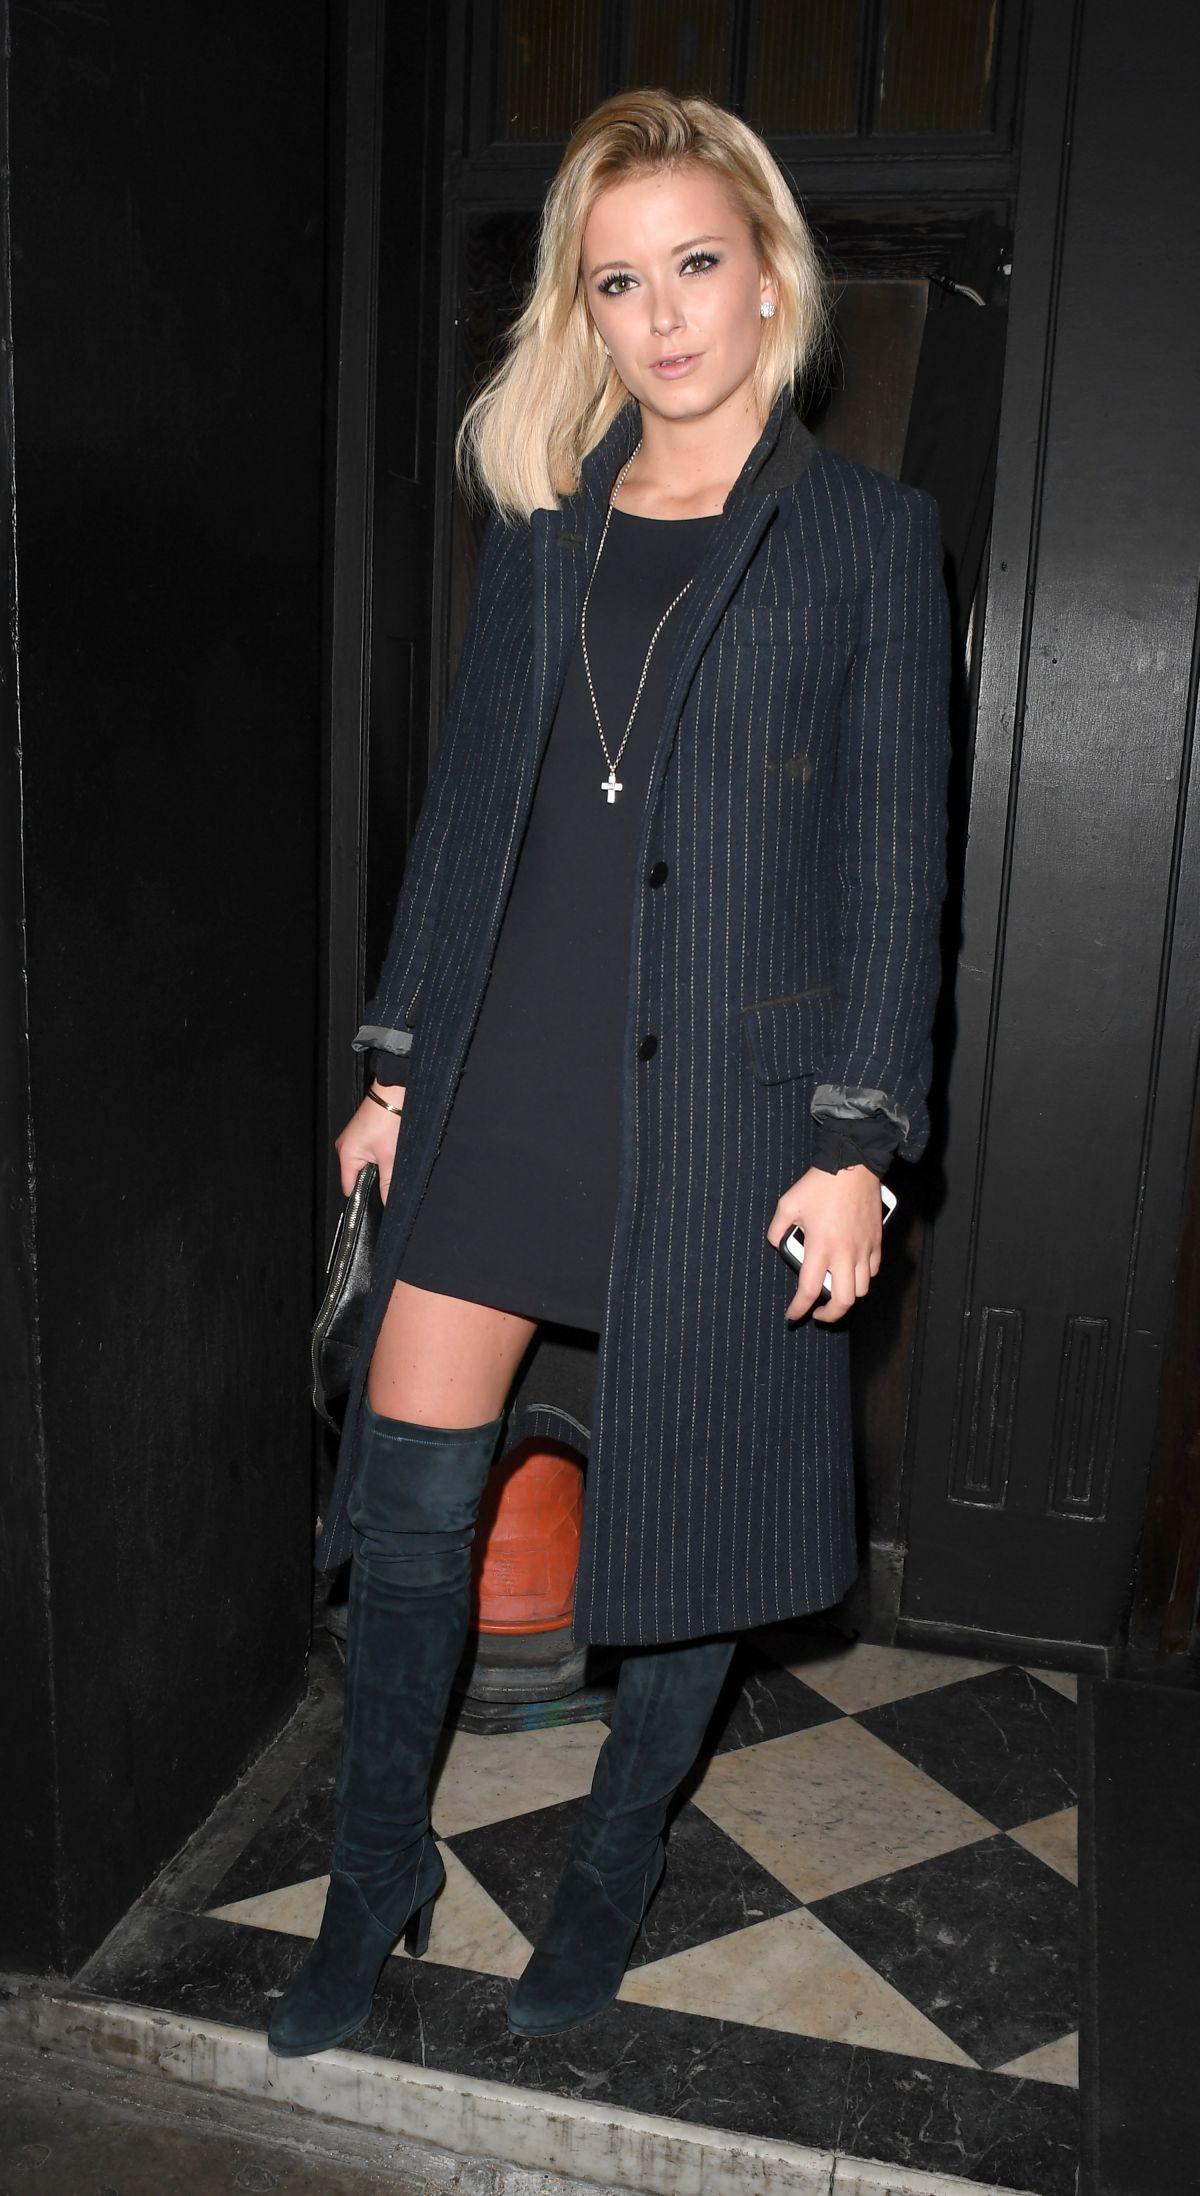 OLIVIA BENTLEY Arrives at Raffles Night Club in London 03/02/2017